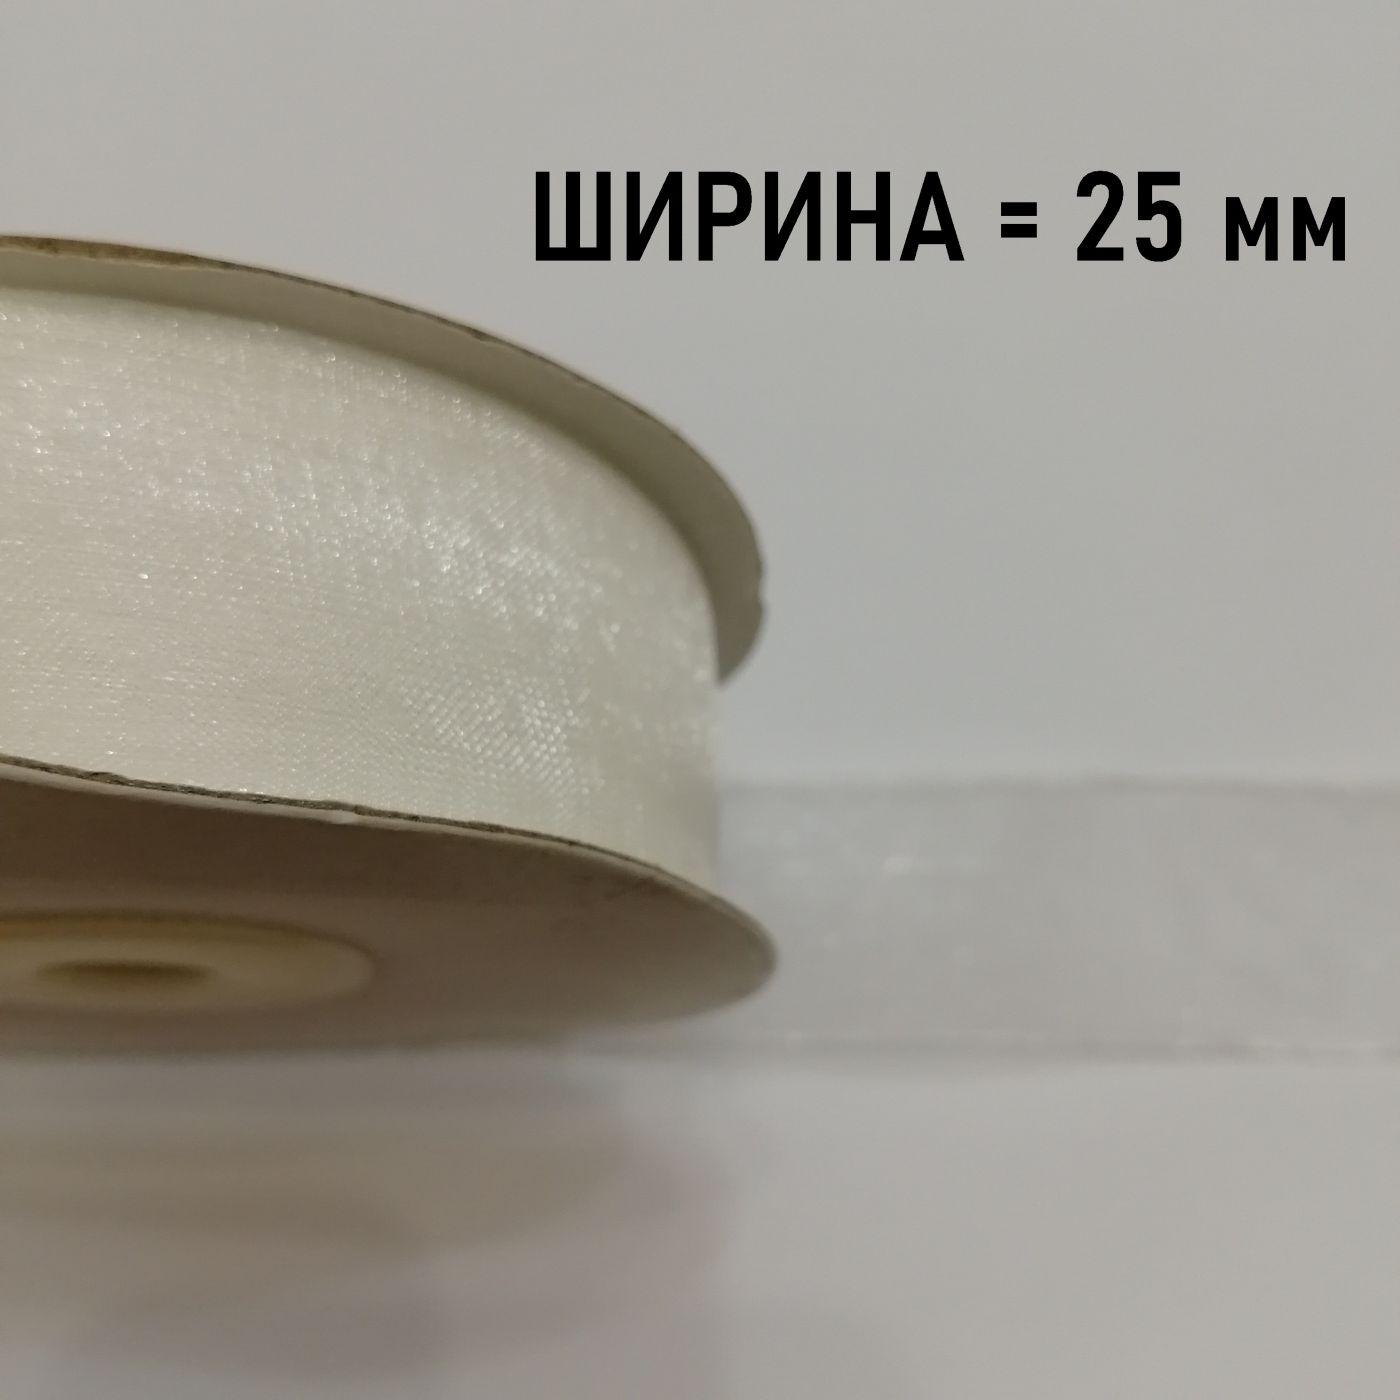 Лента органза Белая Идеал - 25 мм